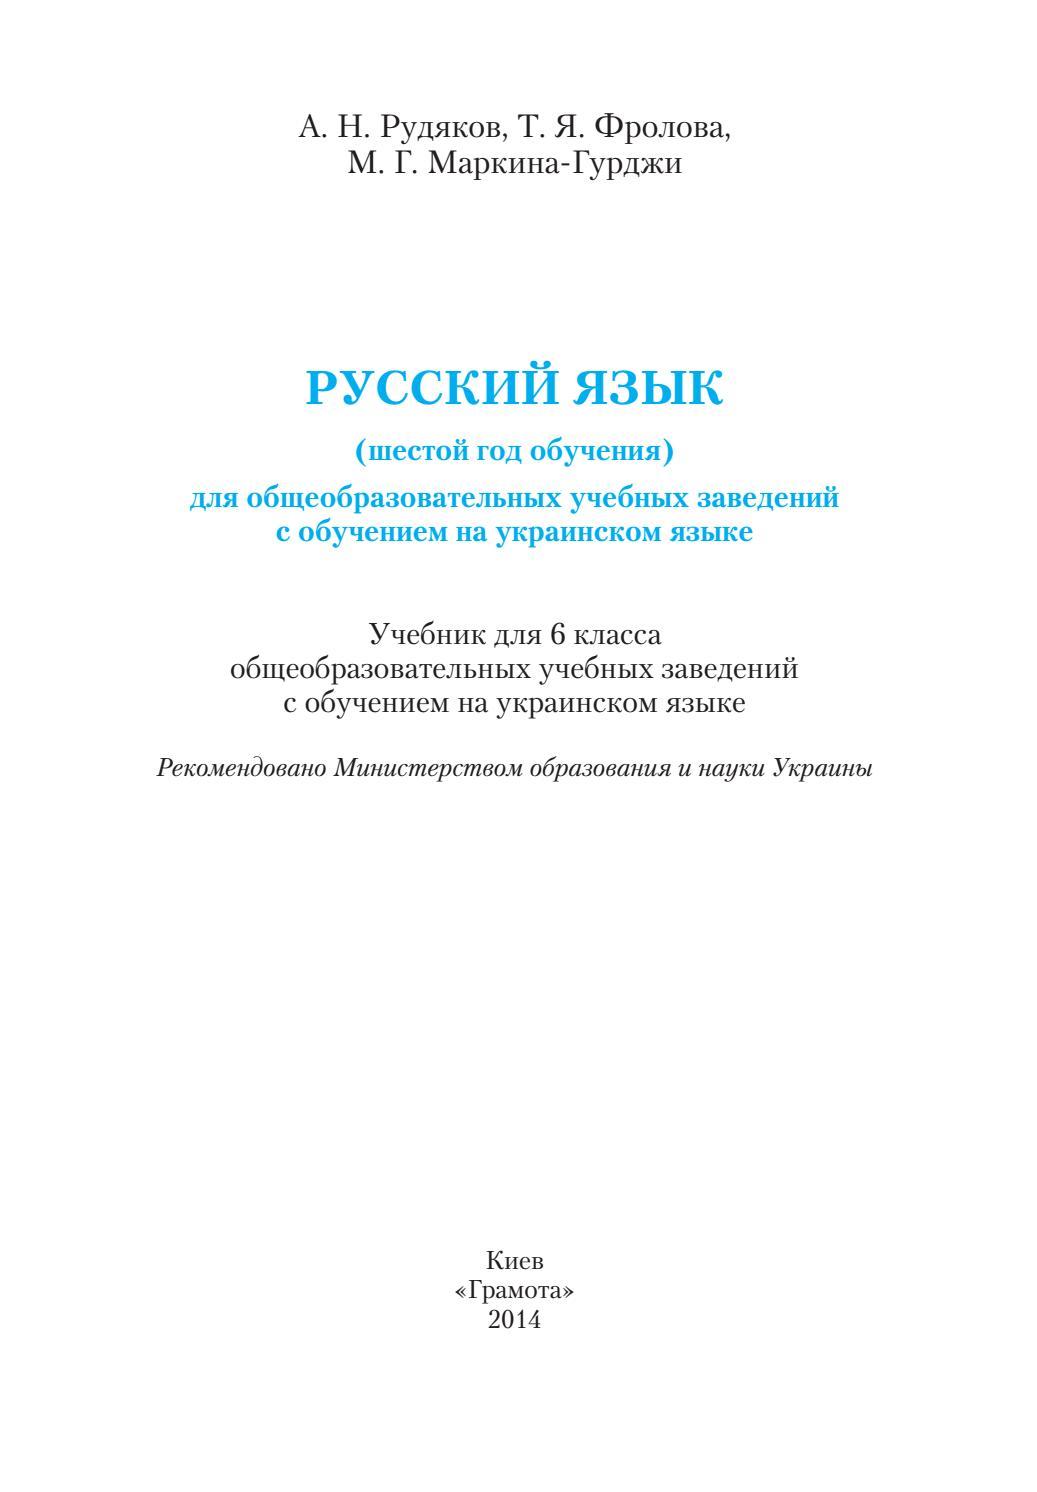 гдз русский язык 11 класс рудяков фролова маркина онлайн